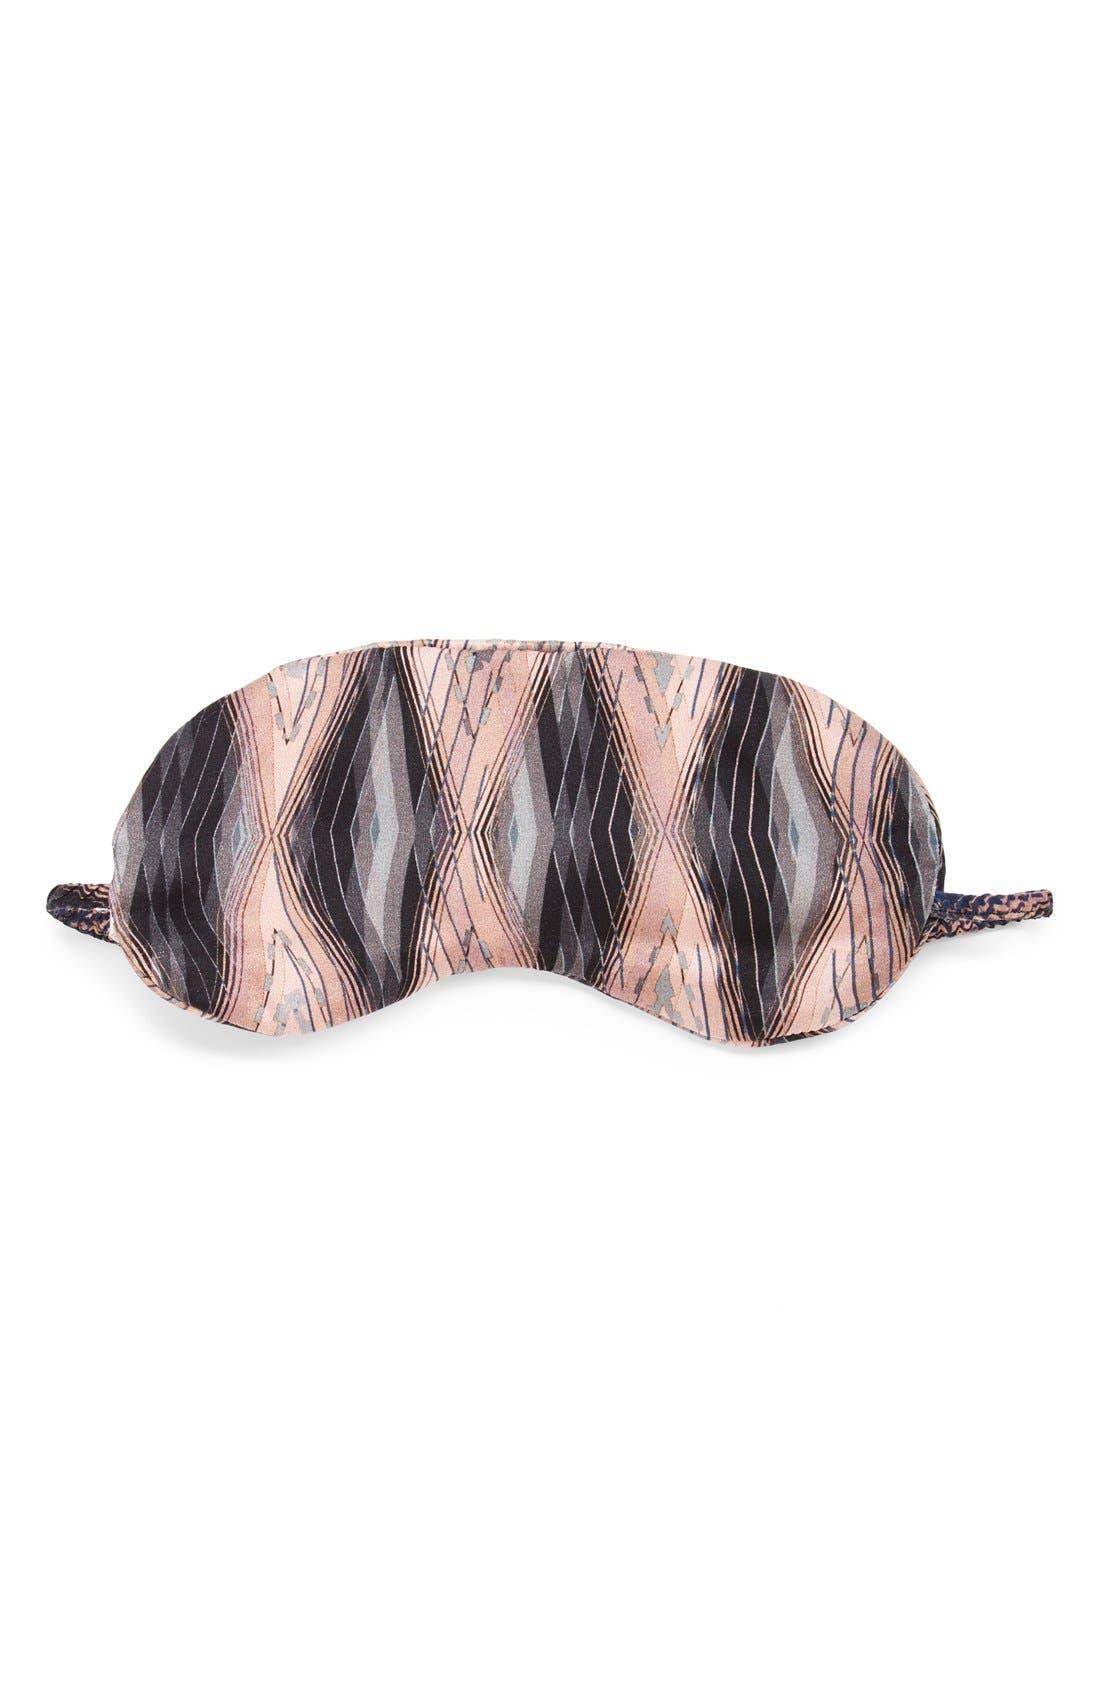 Alternate Image 1 Selected - Asceno by Beautiful Bottoms Silk Sleep Mask